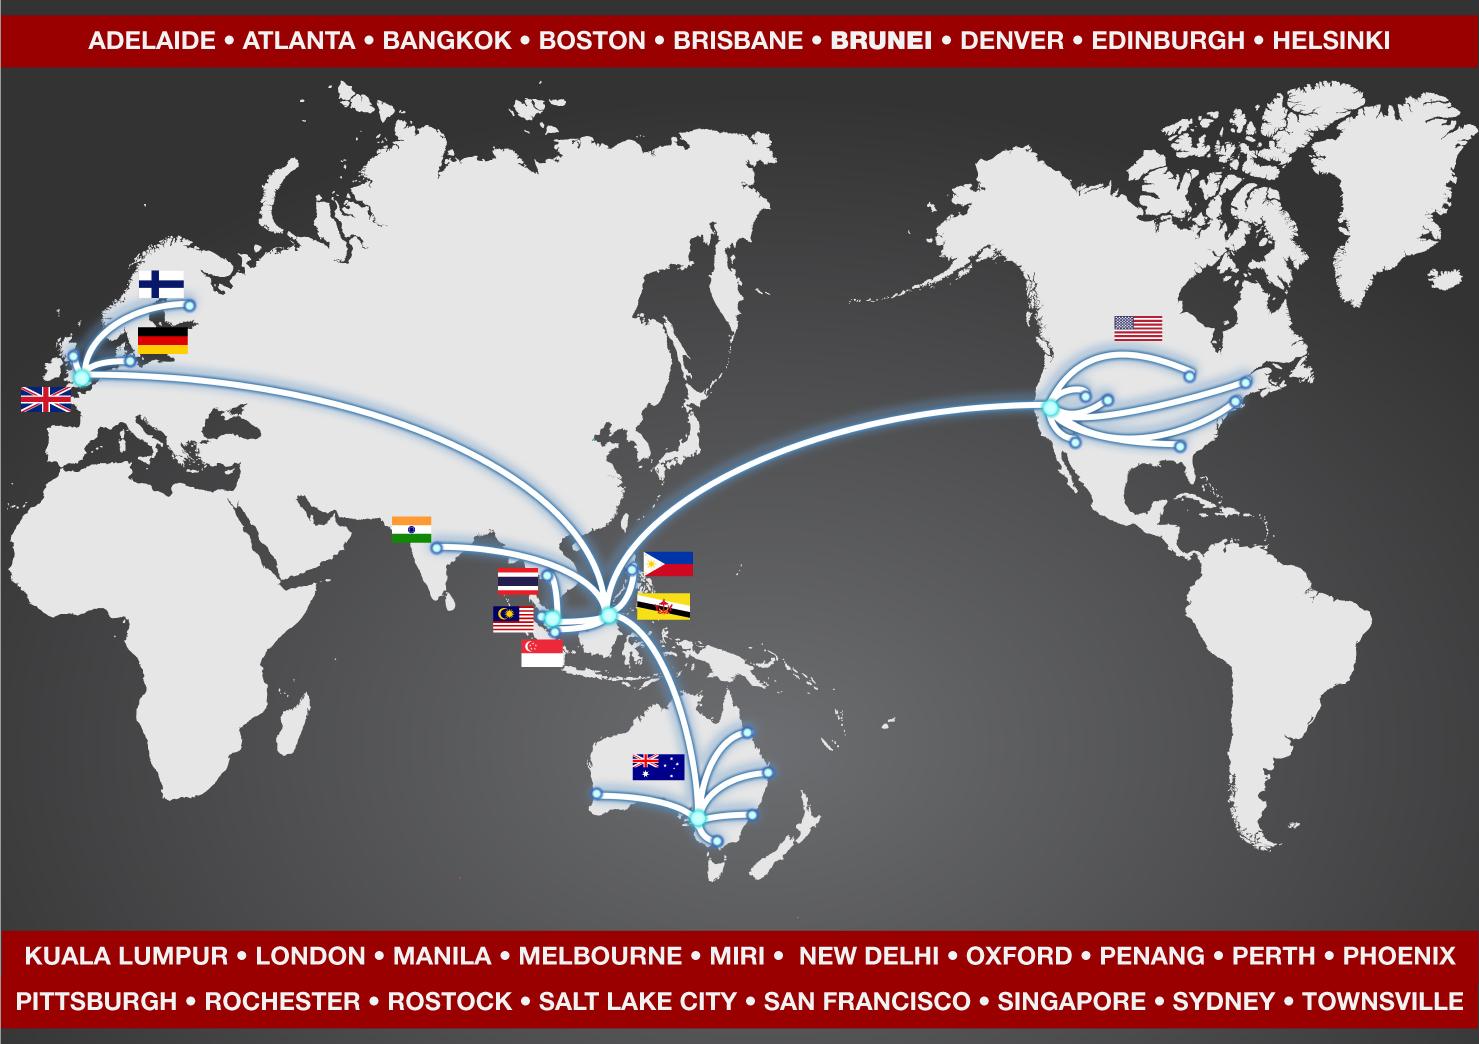 QLAB World Network 2.1.12 Web Version